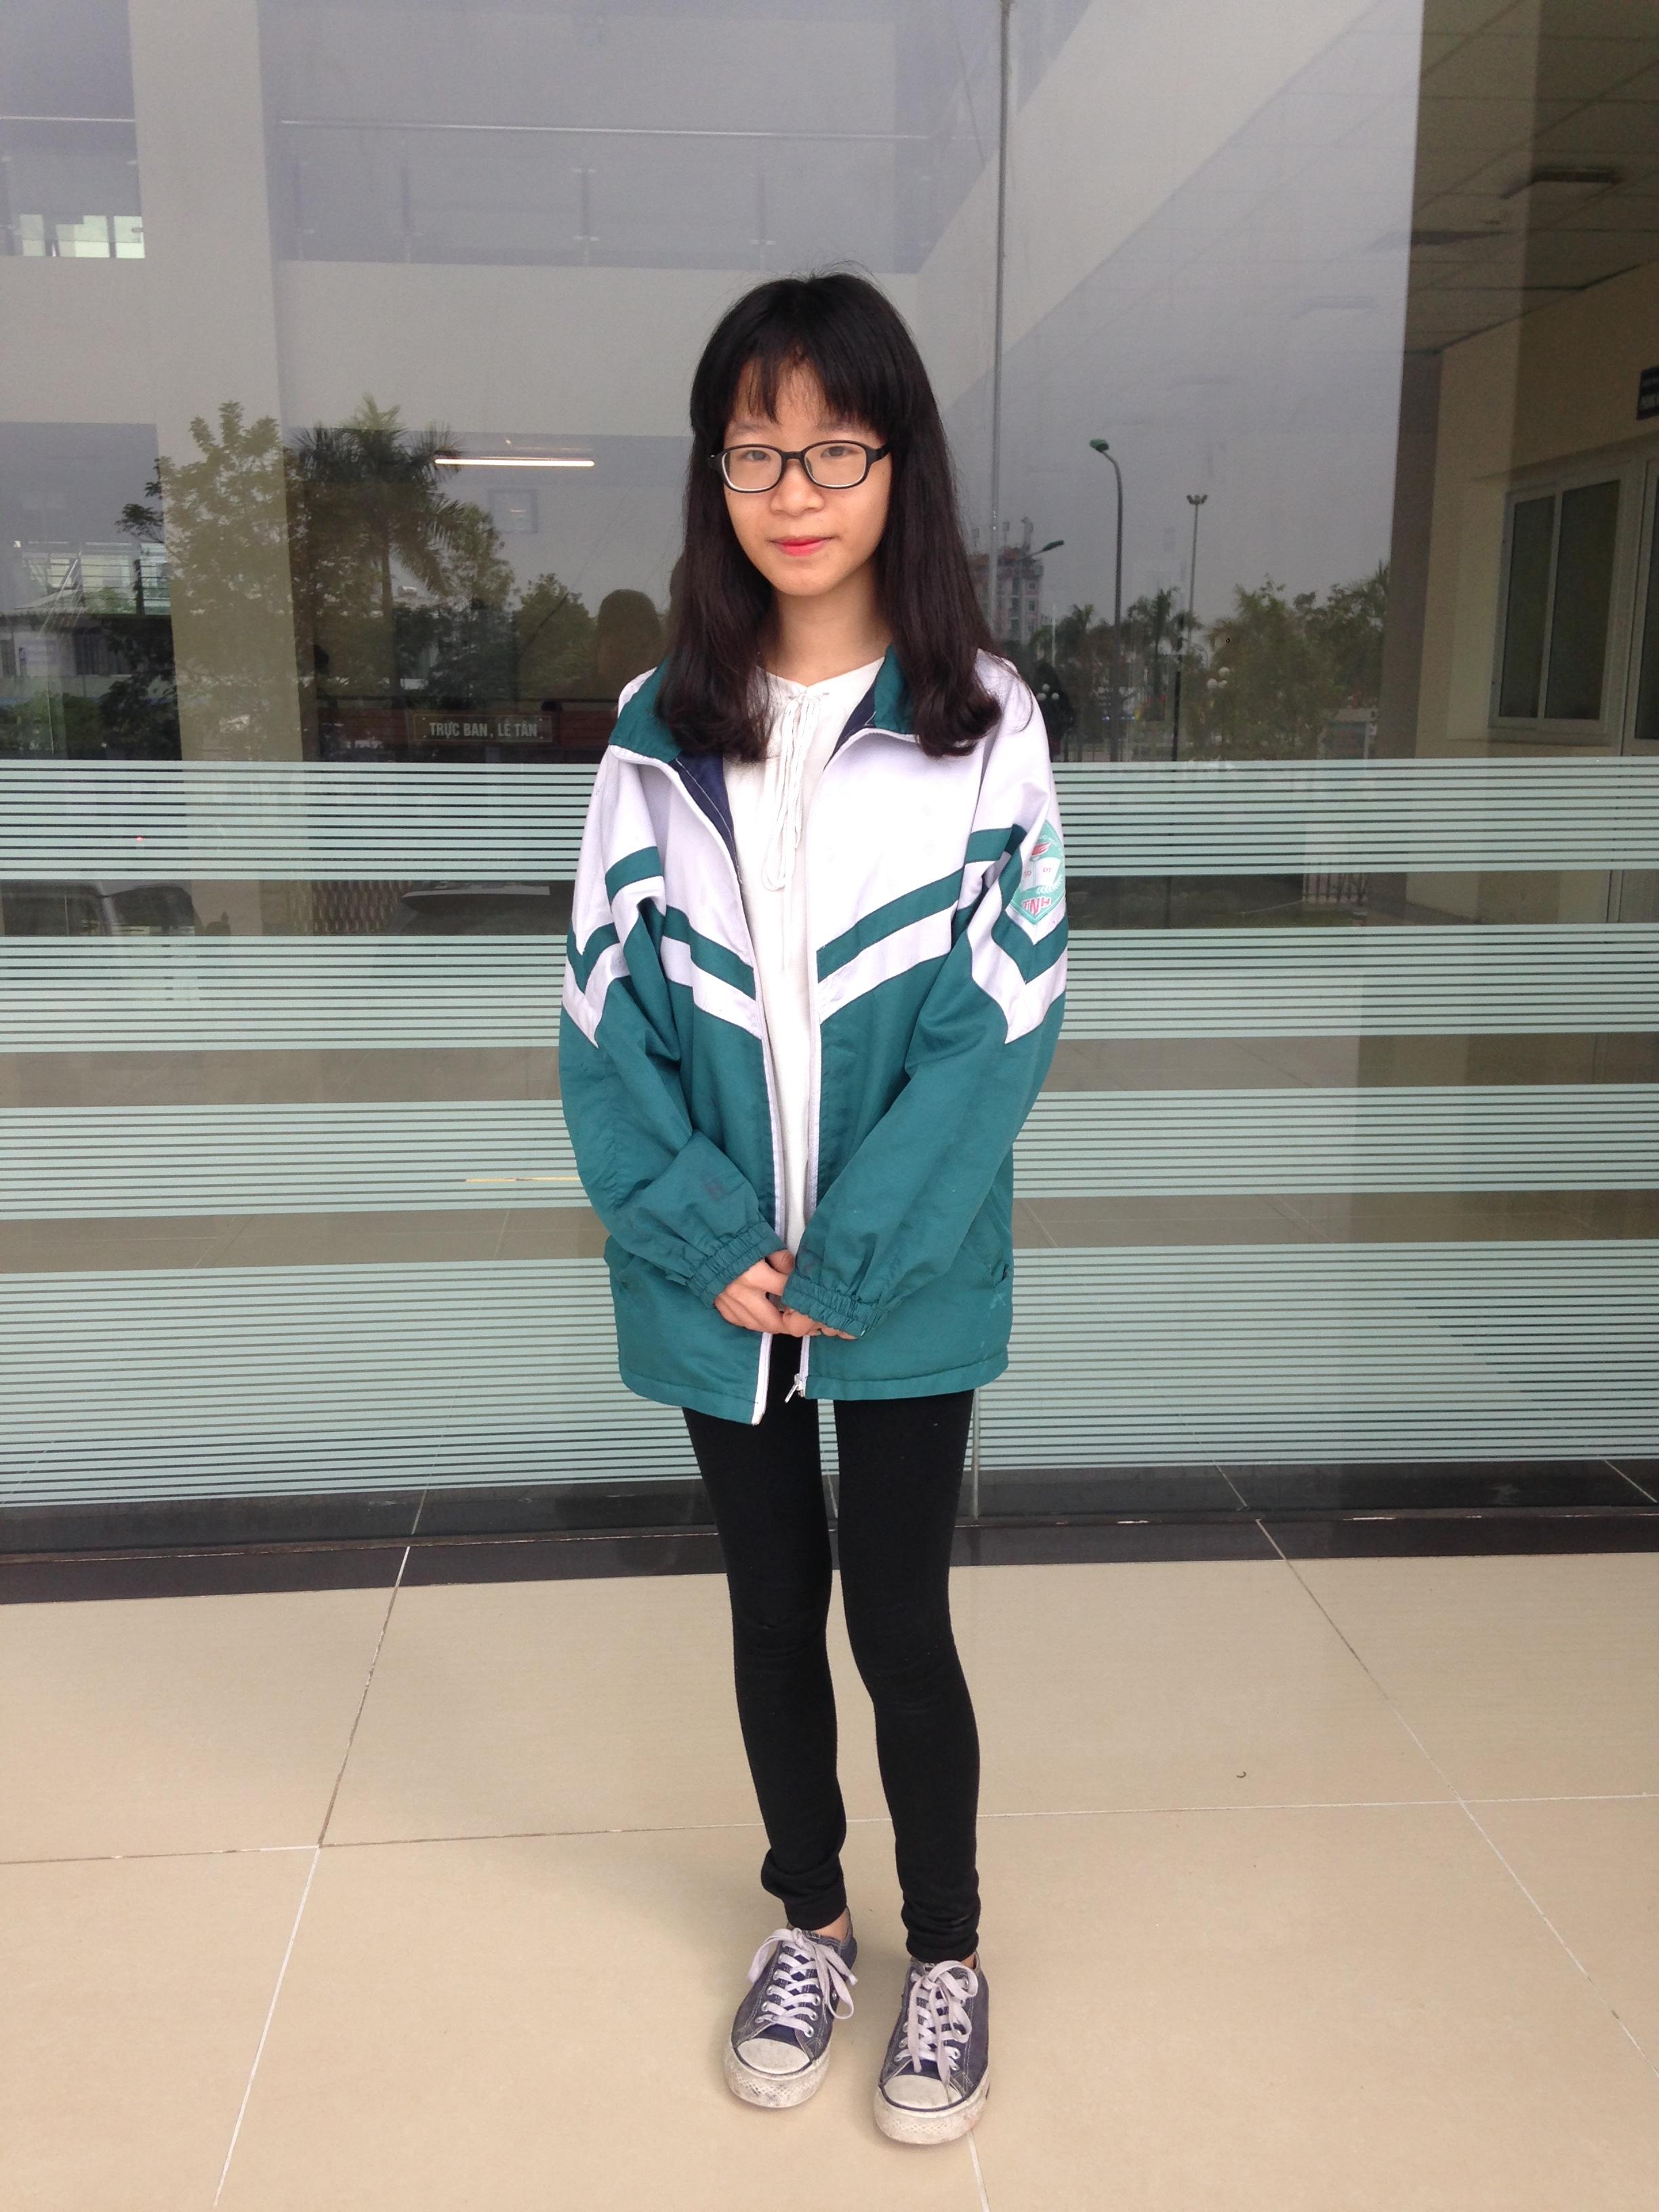 KUPIEC_TRAN Phuong Chi